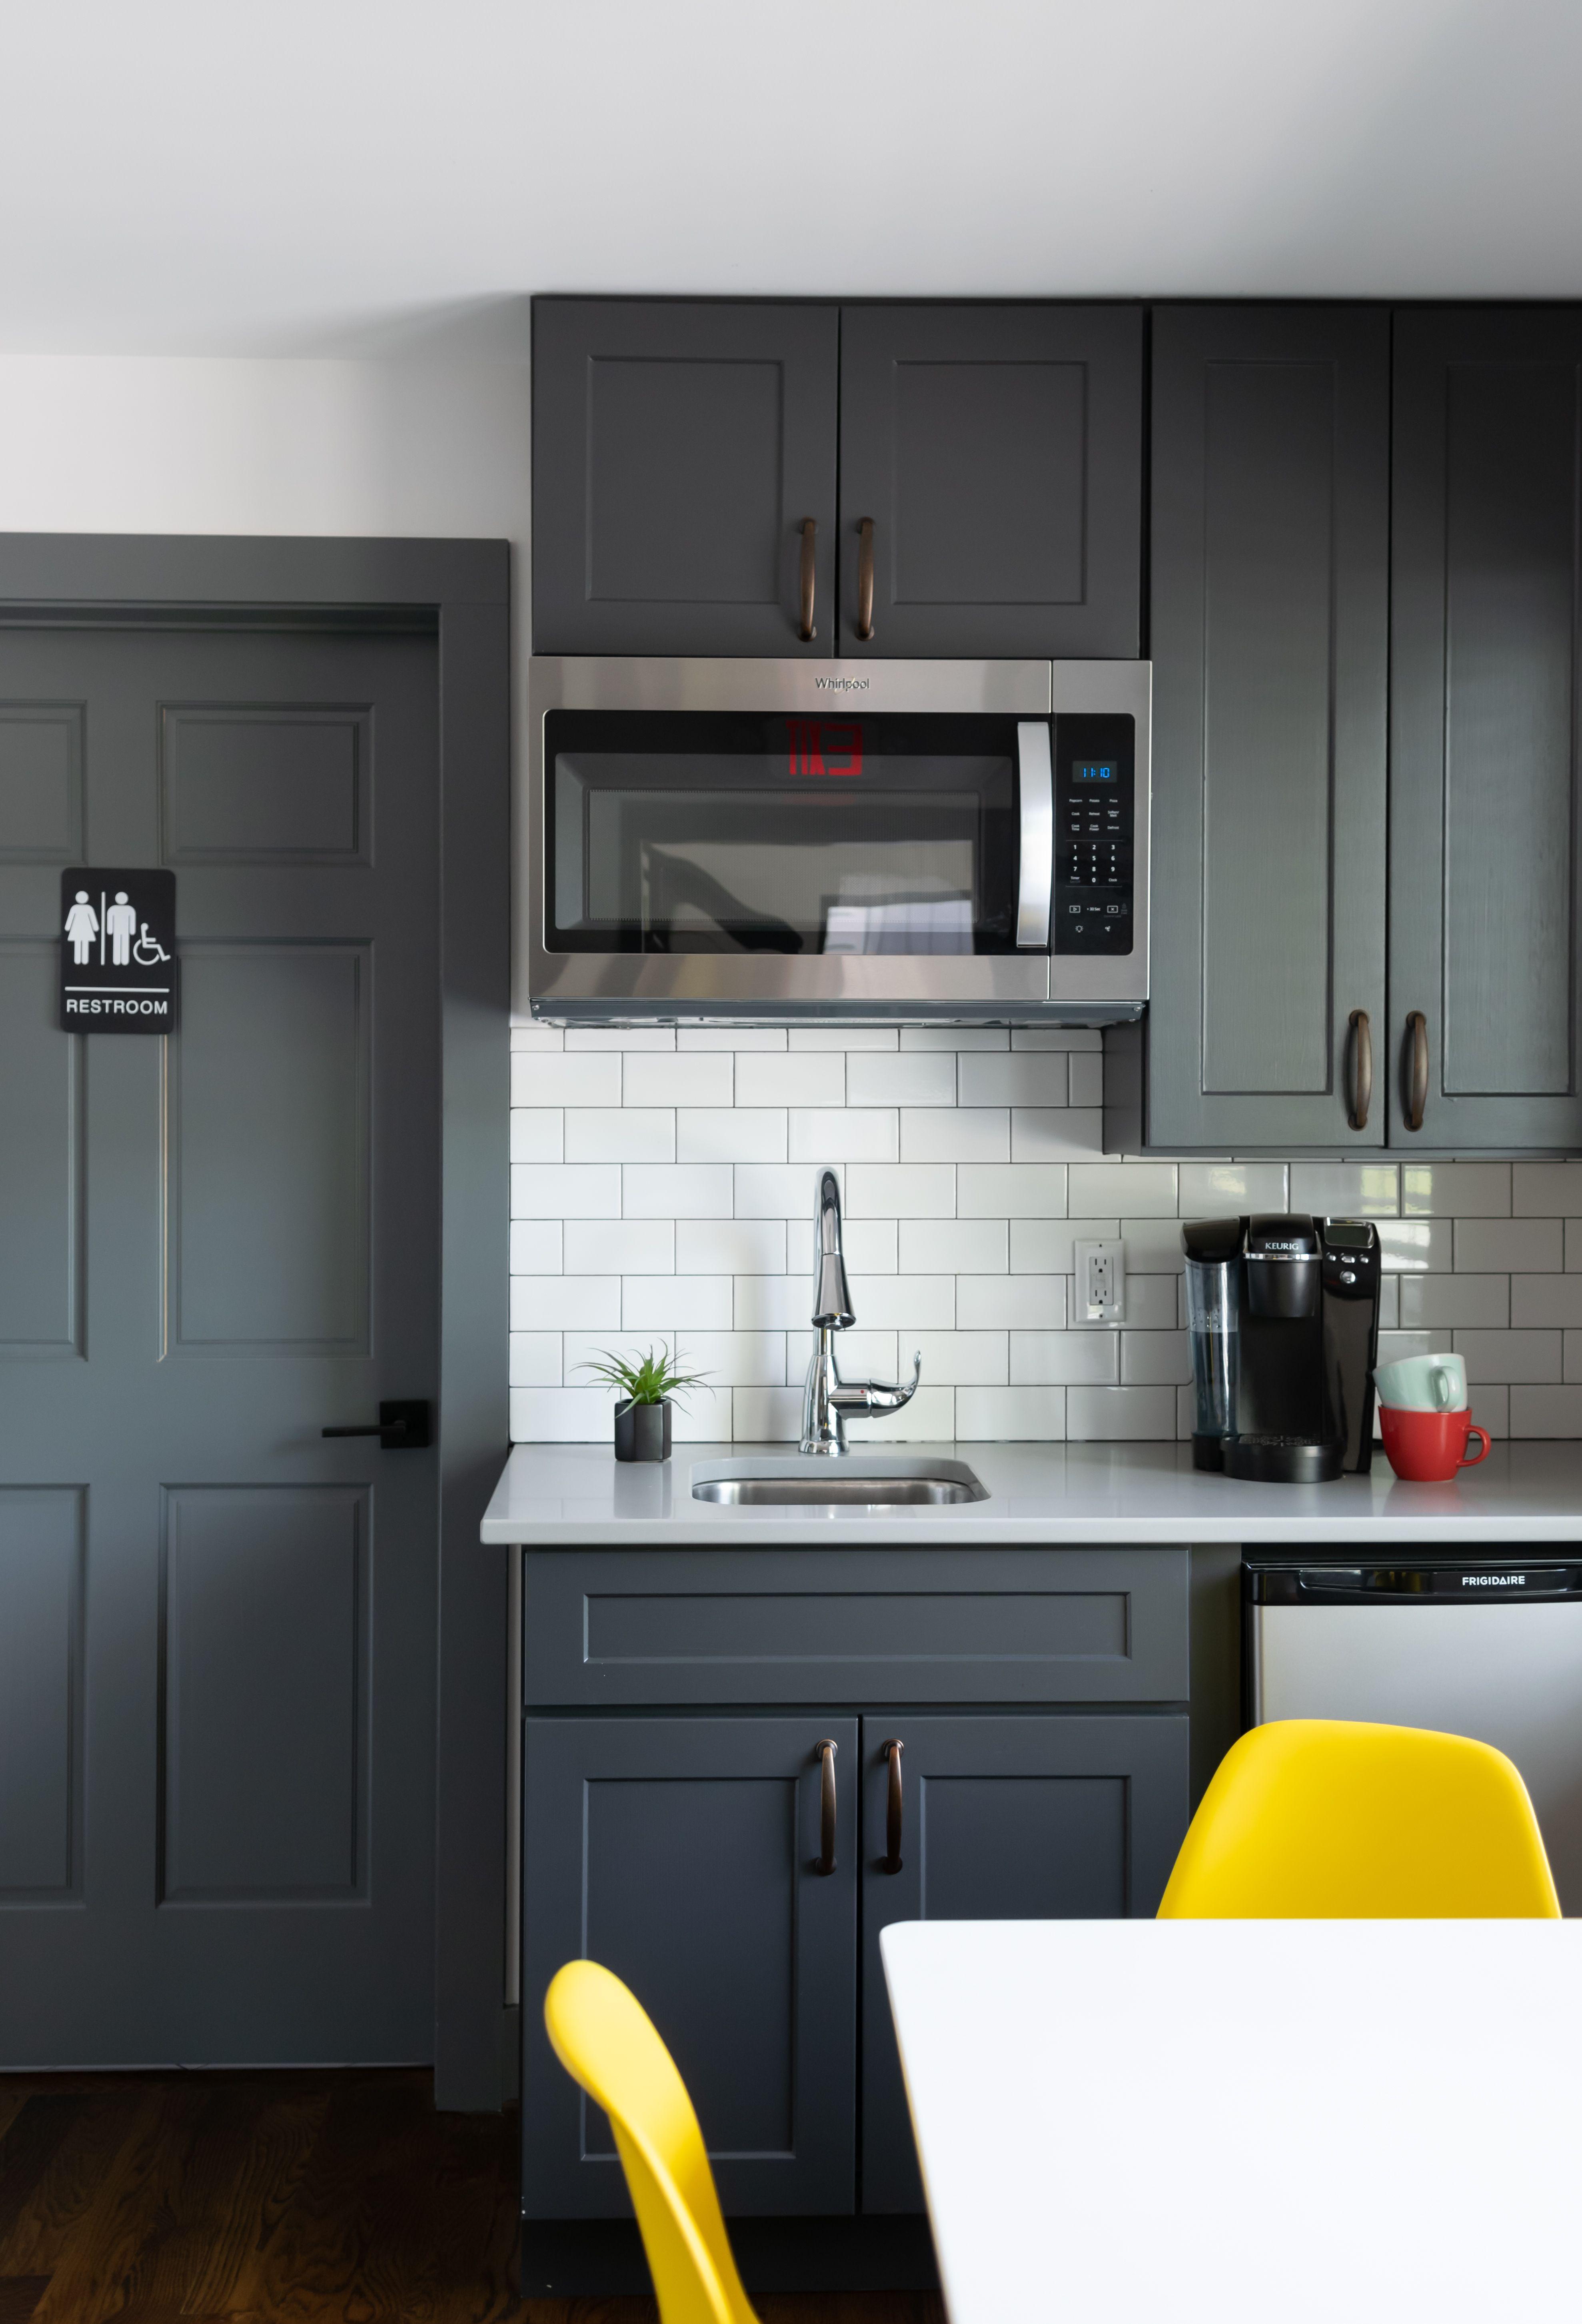 Office Kitchenette In 2020 Small Kitchenette Office Kitchenette Kitchen Cabinet Design